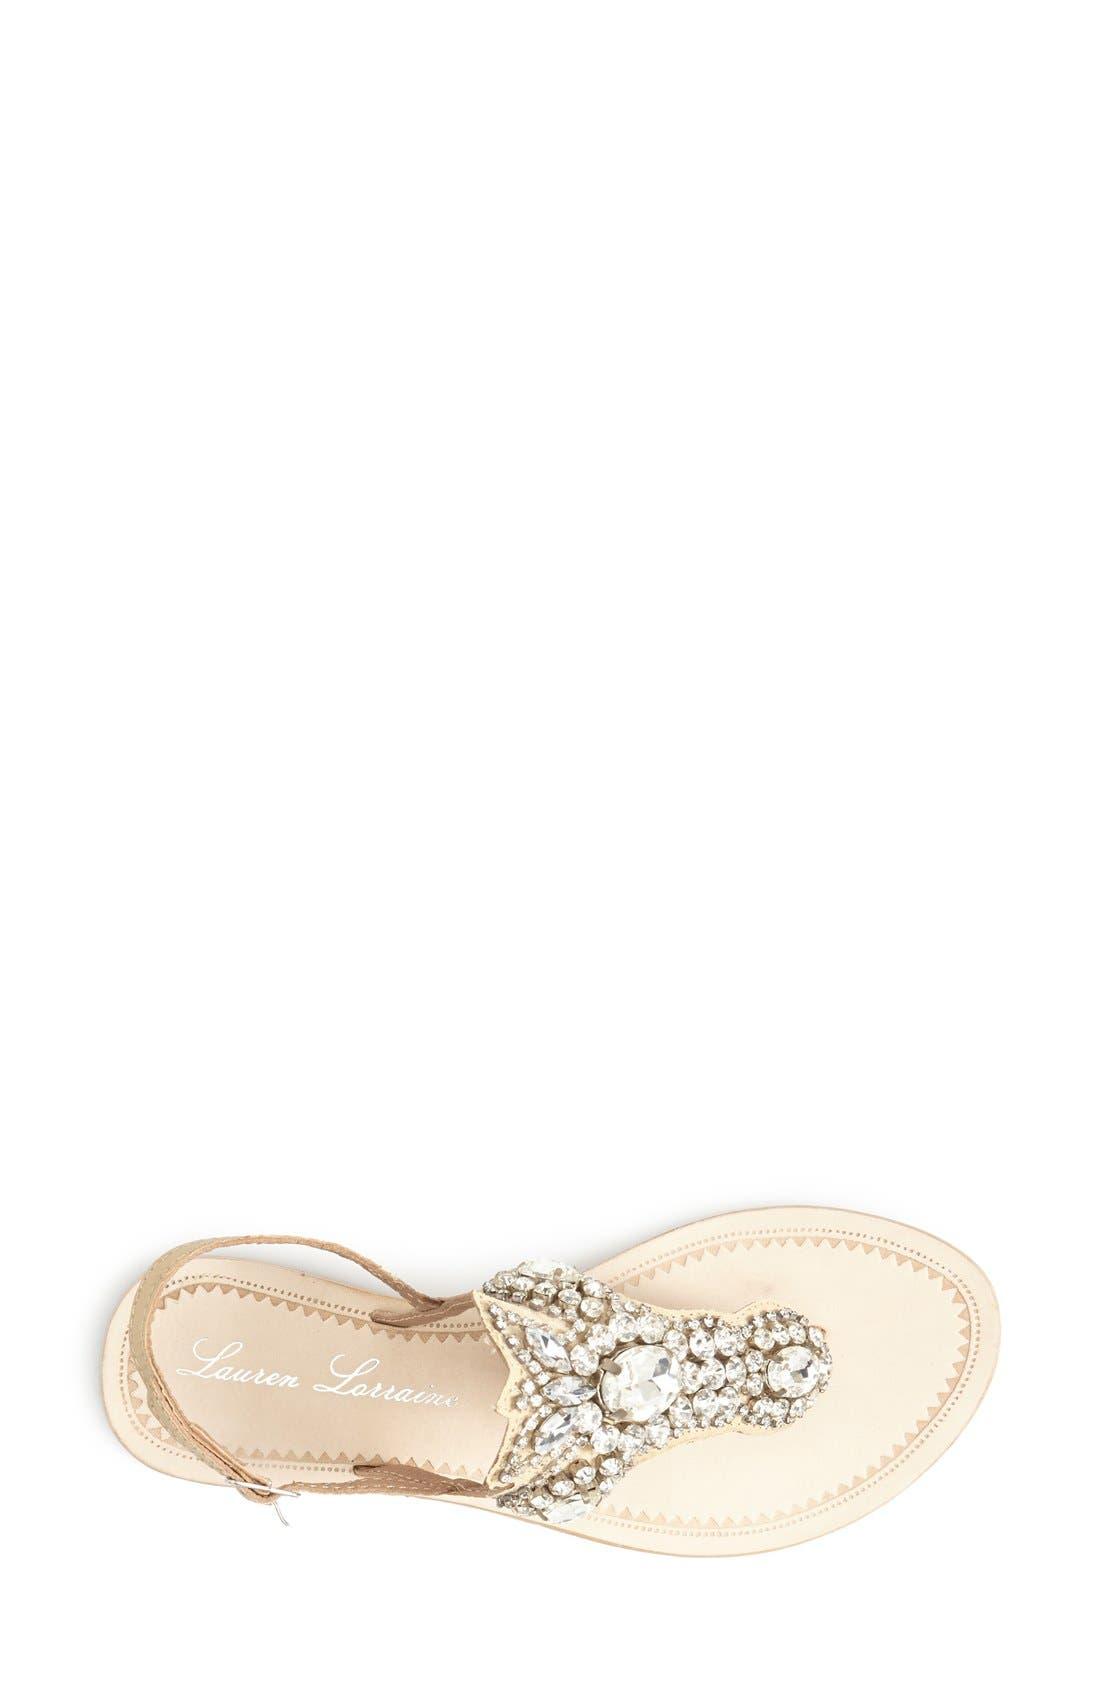 Alternate Image 3  - Lauren Lorraine 'Ibiza' Crystal Thong Sandal (Women)